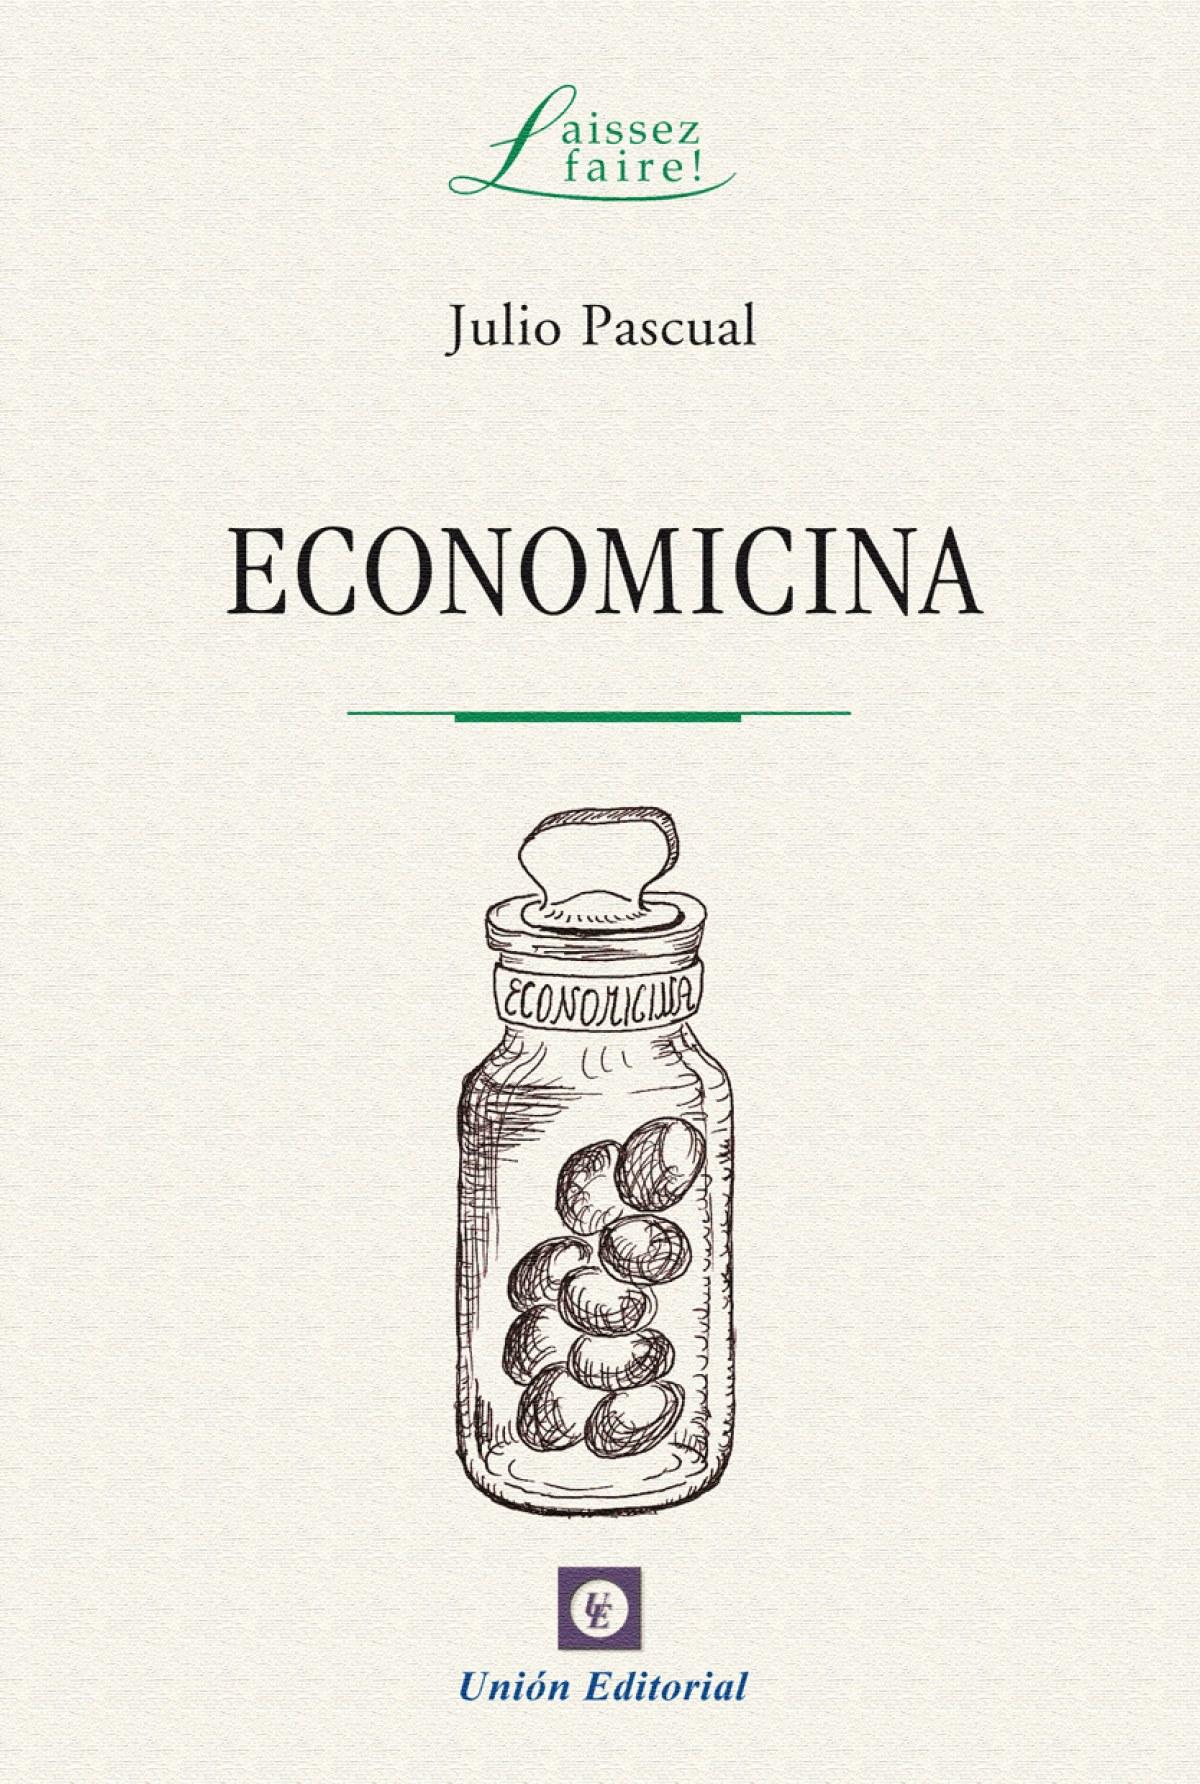 Economicina